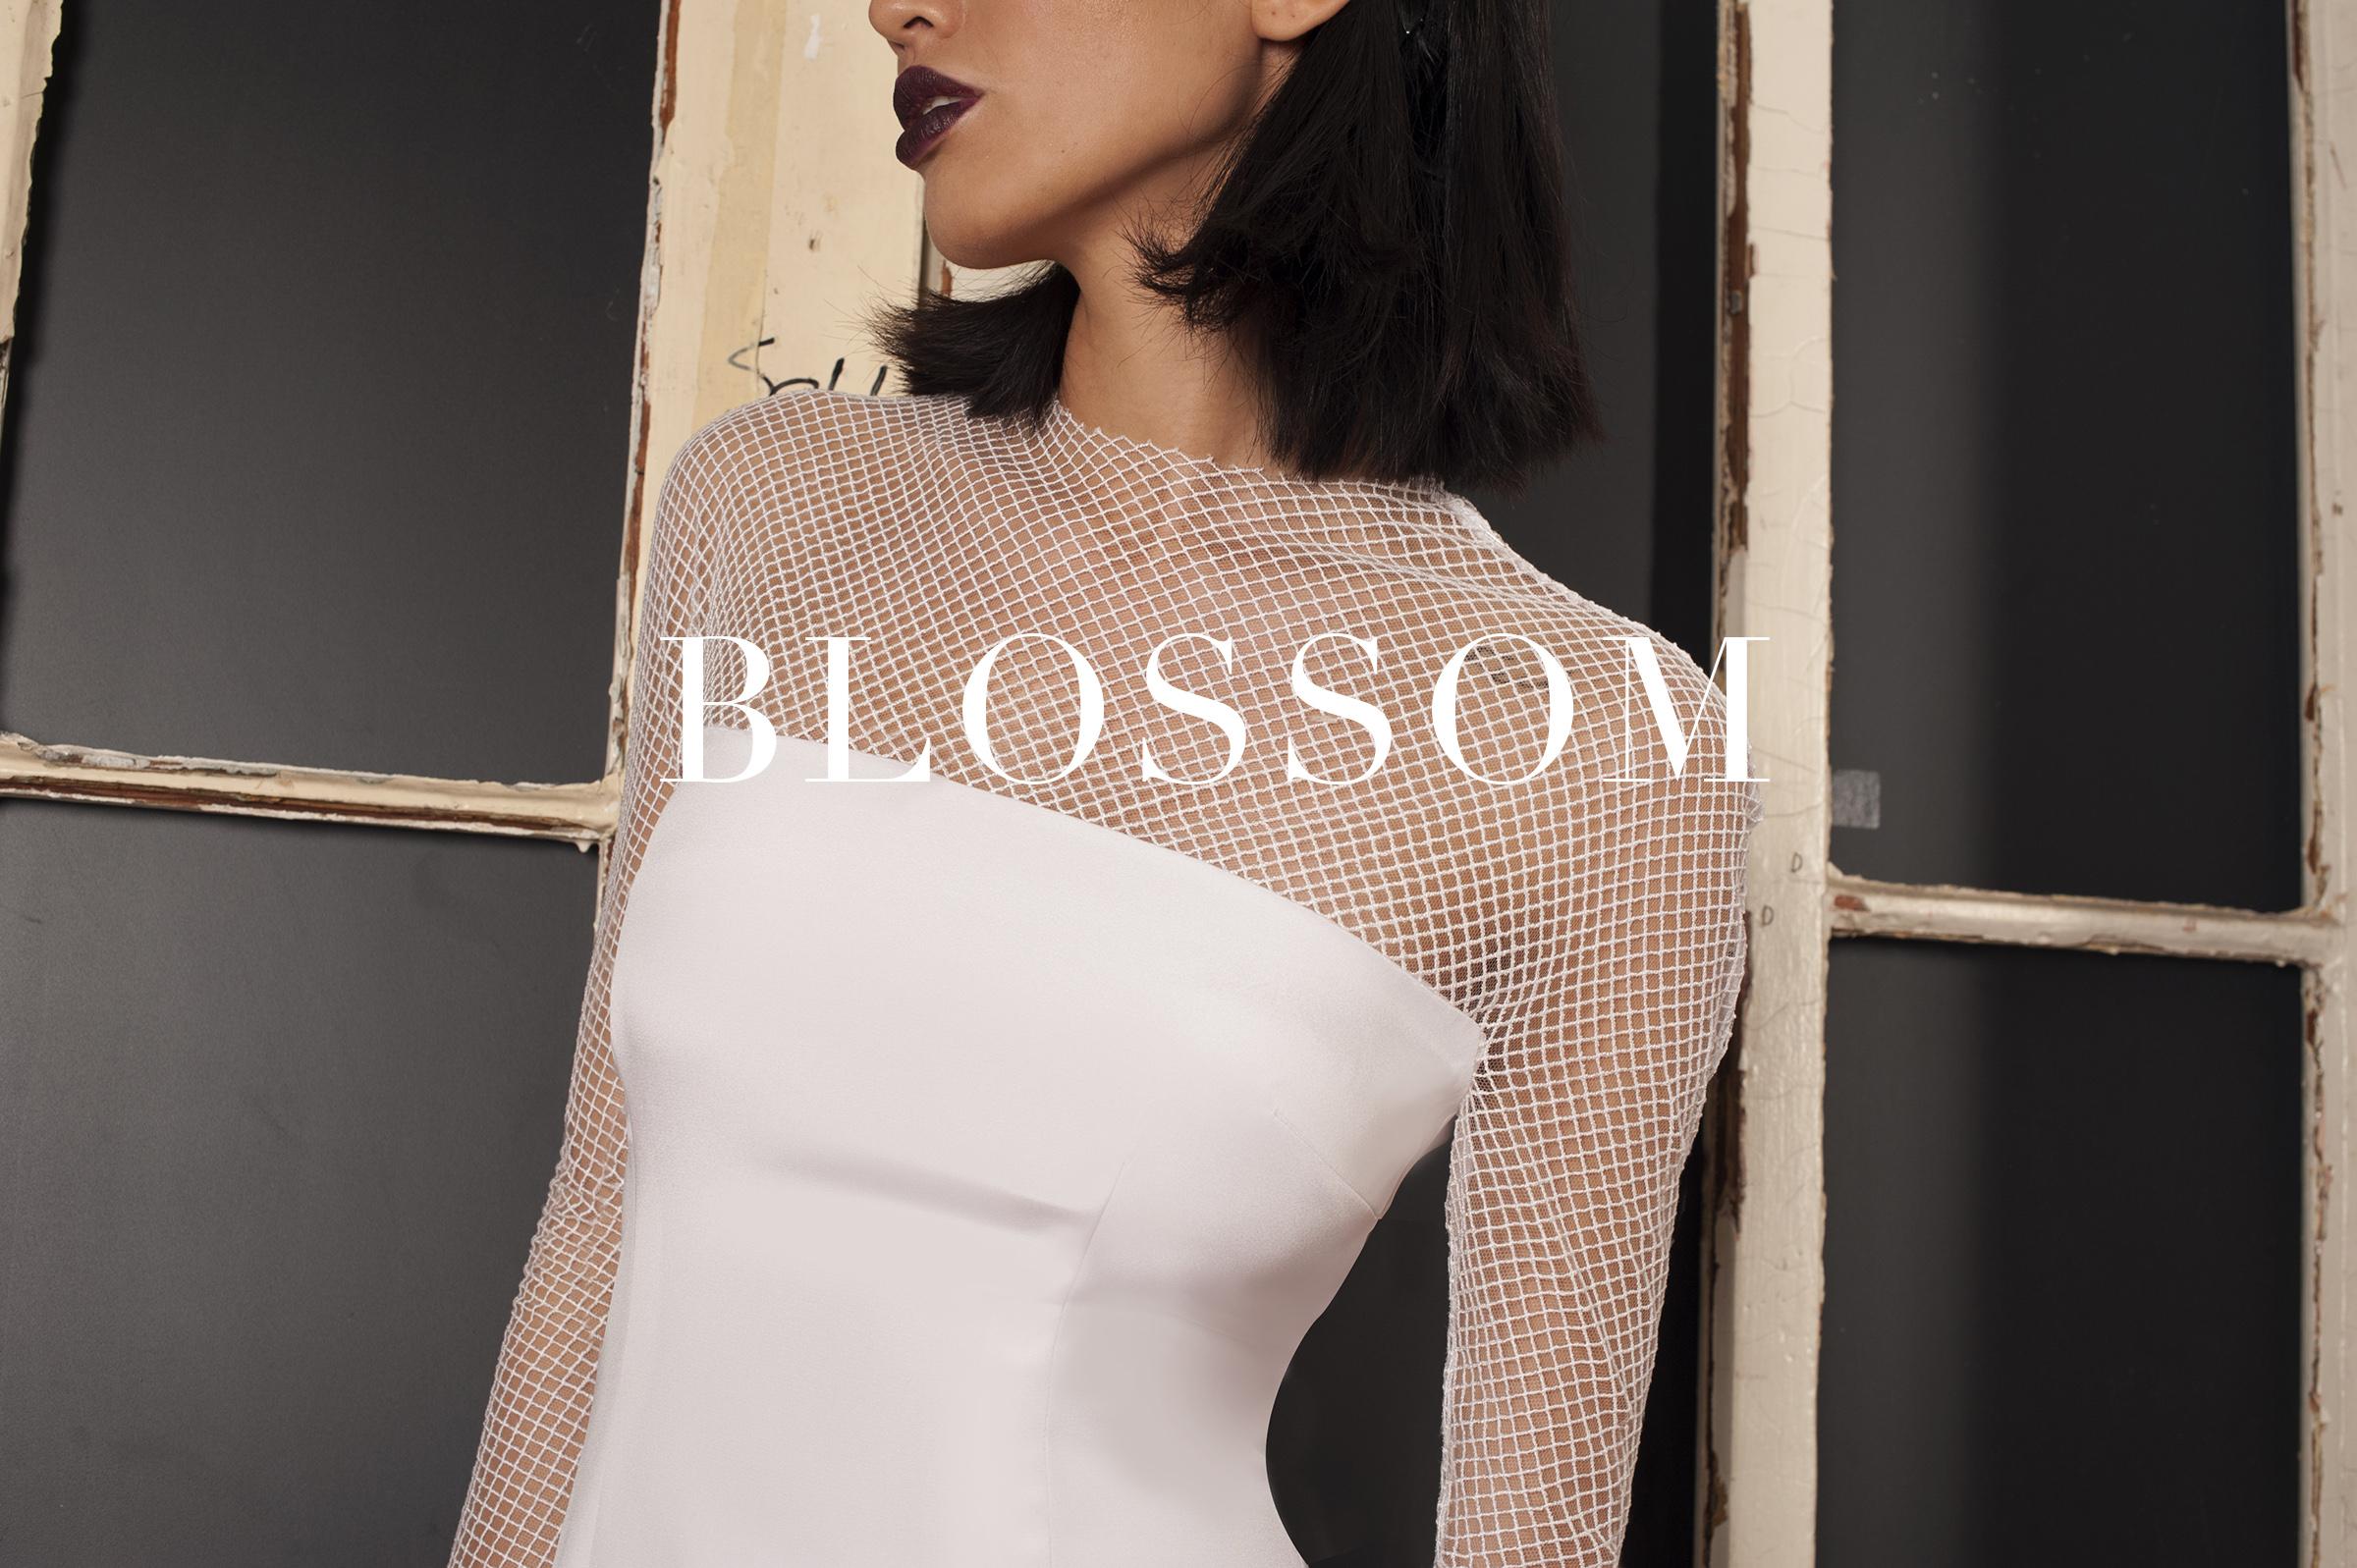 Lakum-Blossom-Title-Cover.jpg